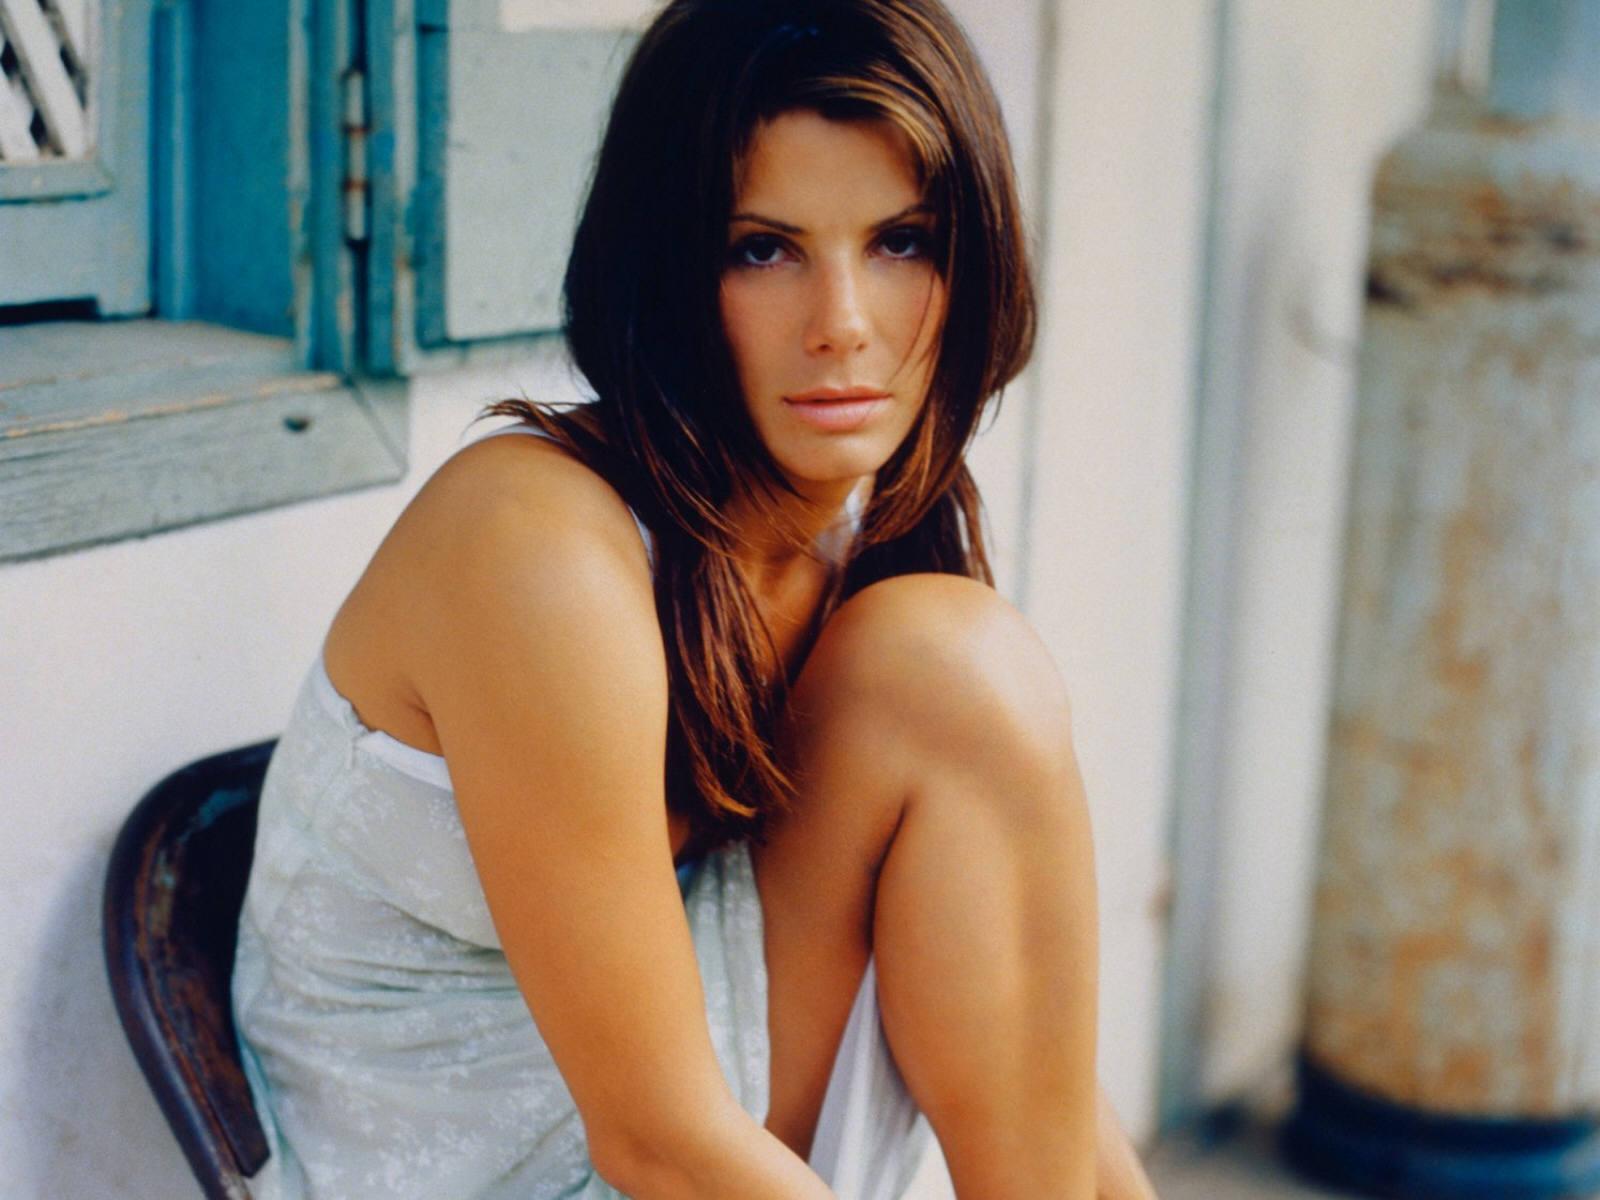 http://2.bp.blogspot.com/-xeWo8qpn7Fw/TkP-kFFE2FI/AAAAAAAAEIg/3IFs6f8nUmE/s1600/Sandra_Bullock_Wallpapers_beautyful_body_face_and_eyes%2B%25286%2529.jpg